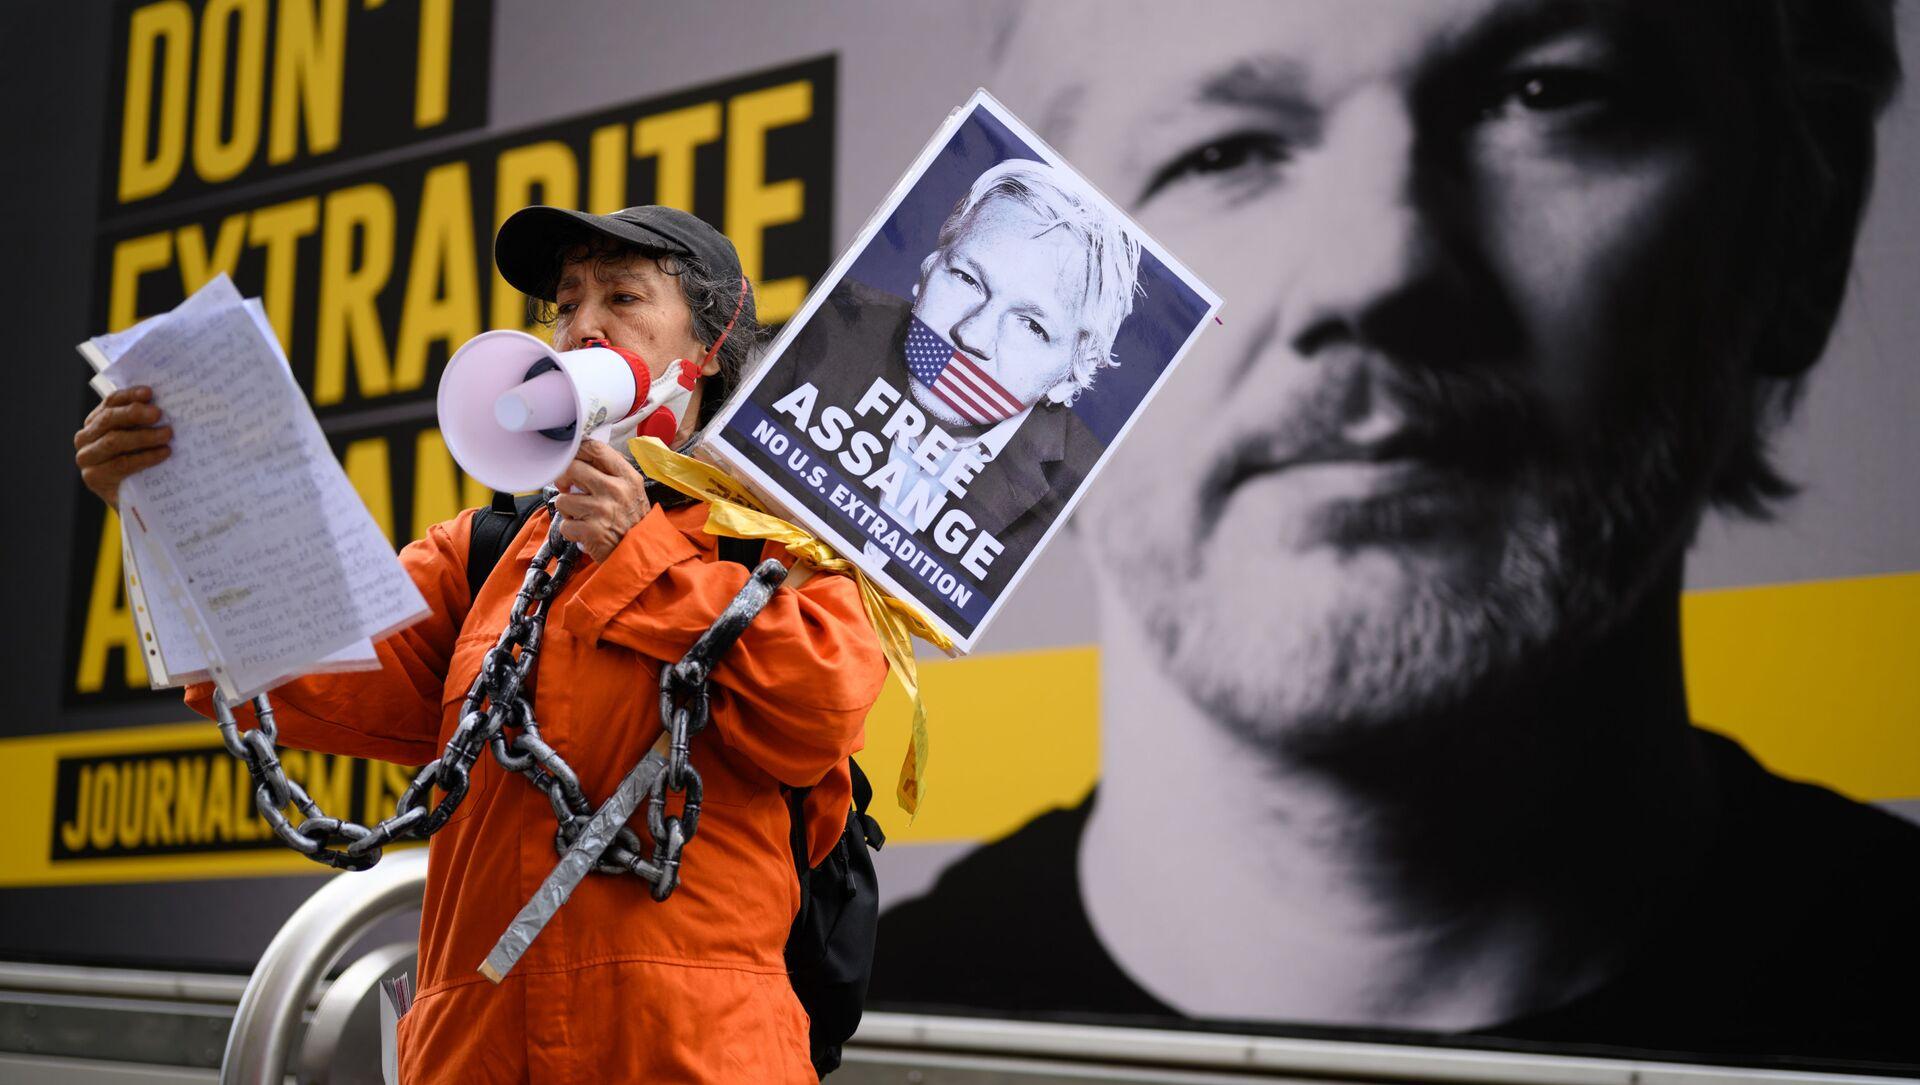 Sostenitori di Assange - Sputnik Italia, 1920, 03.05.2021